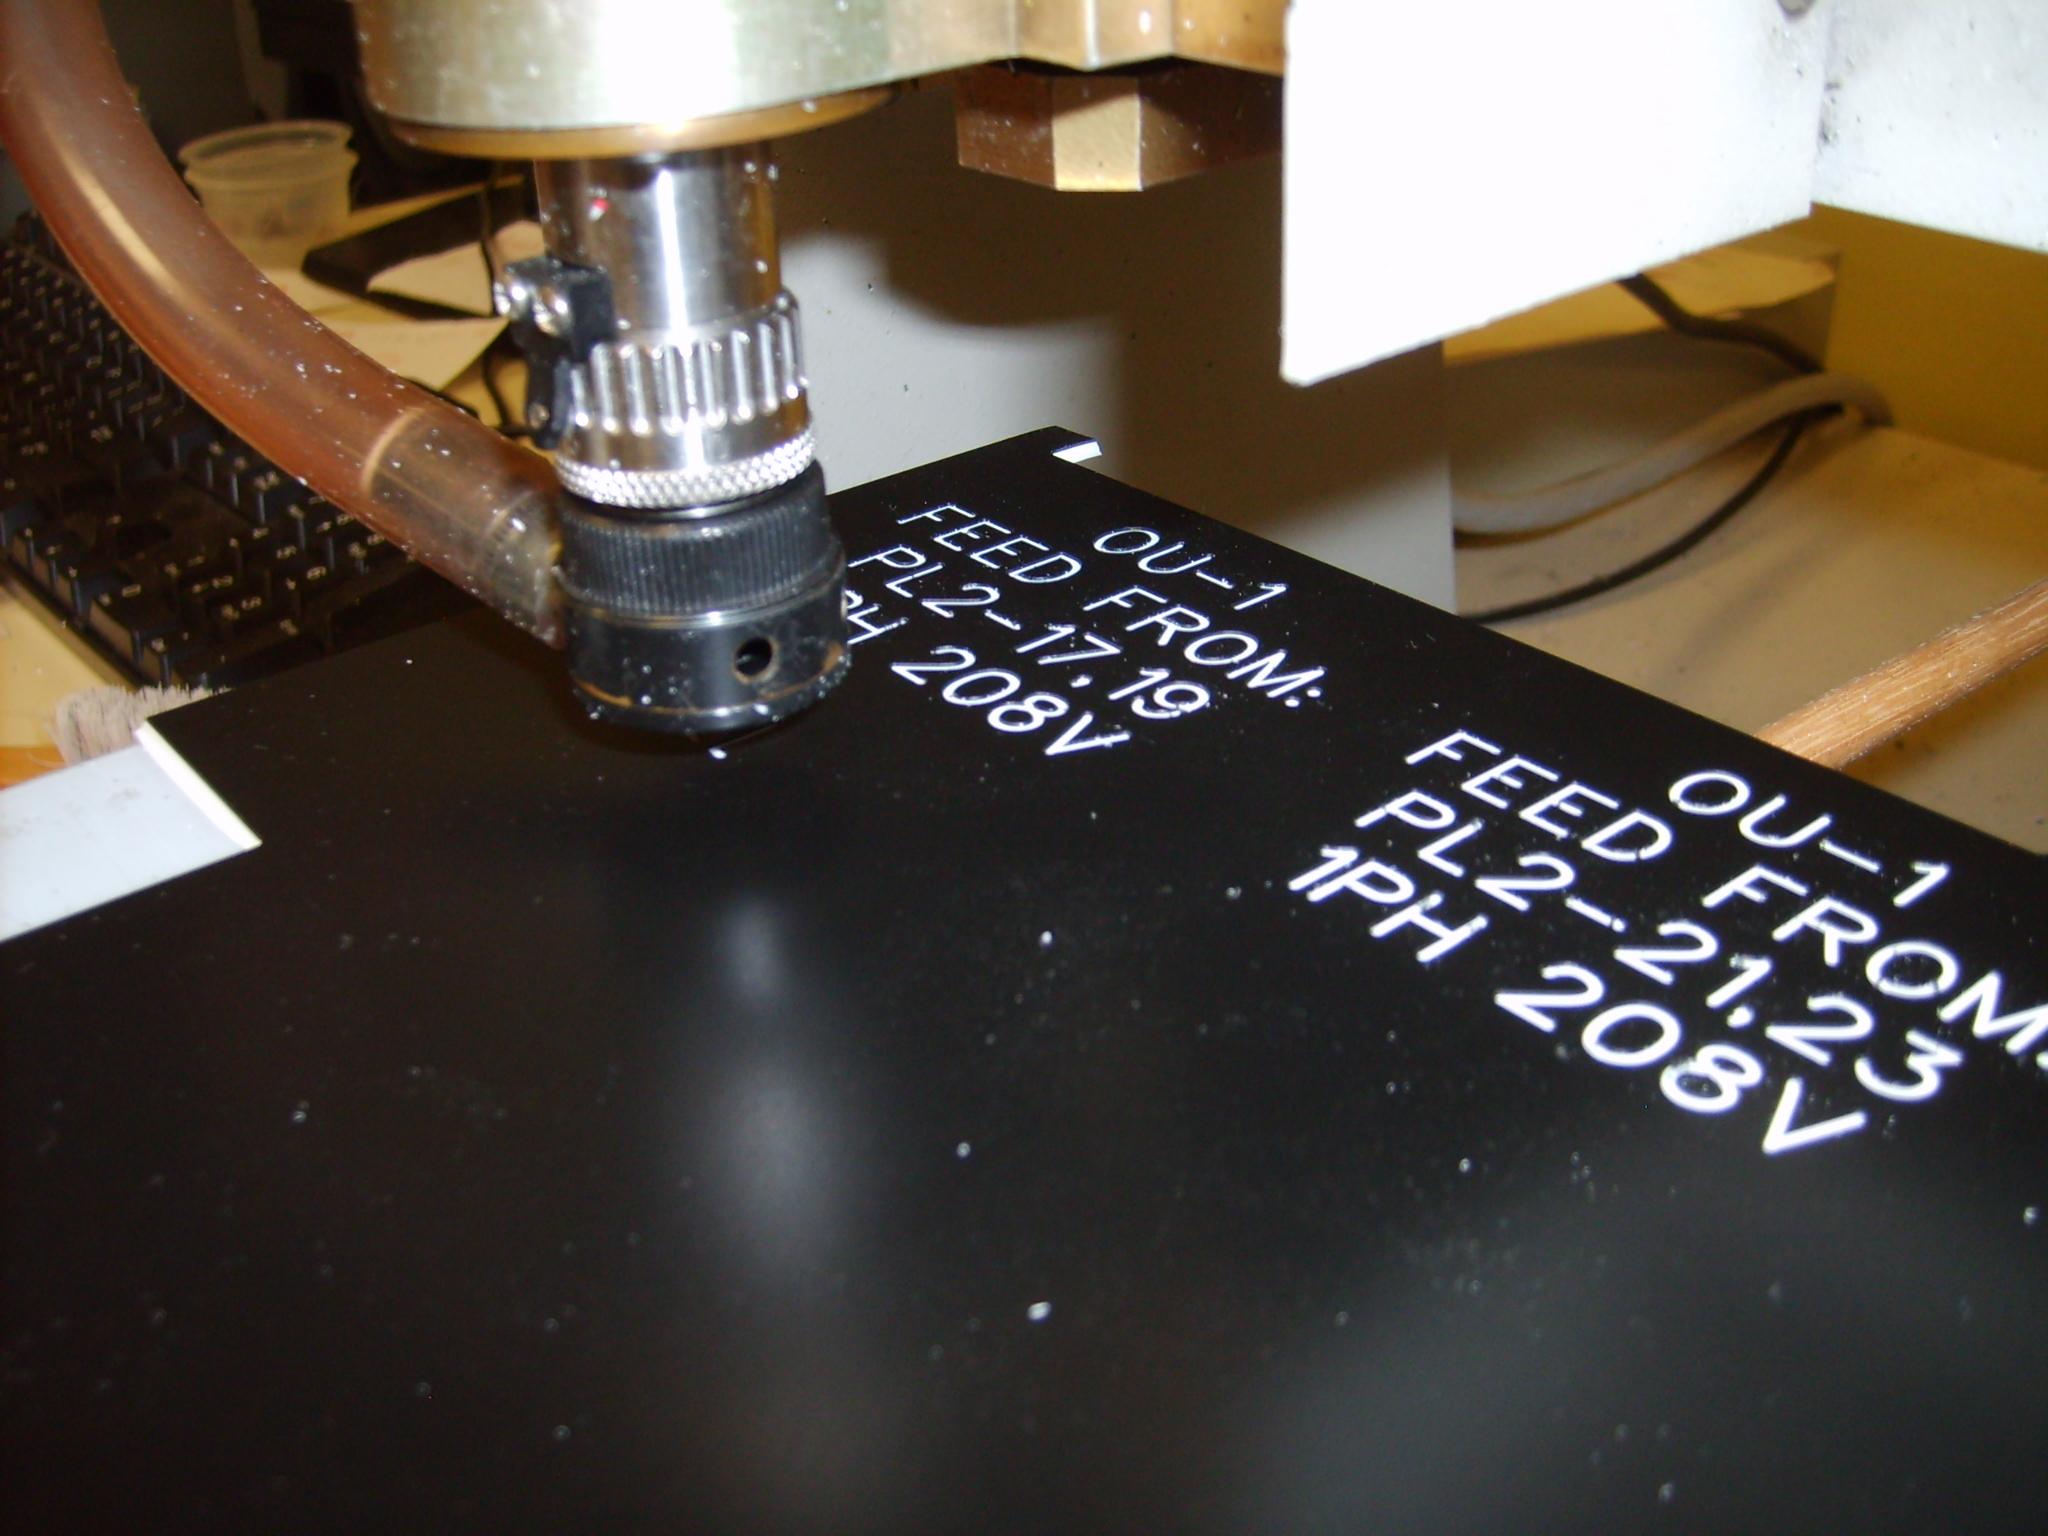 Rotory Engraver